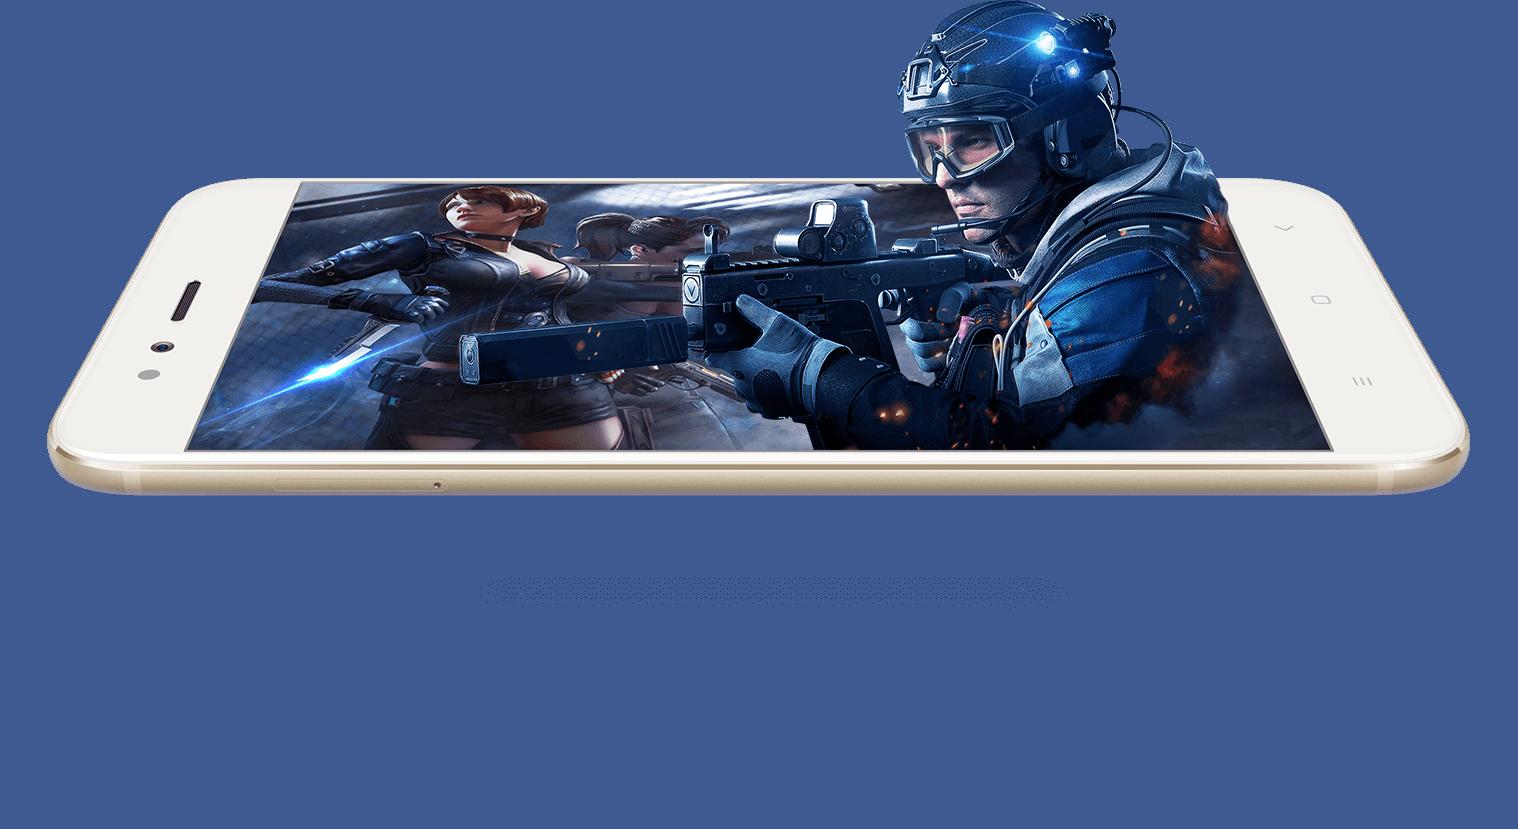 Xiaomi Mi A1 EU - Smartphone de 5.5